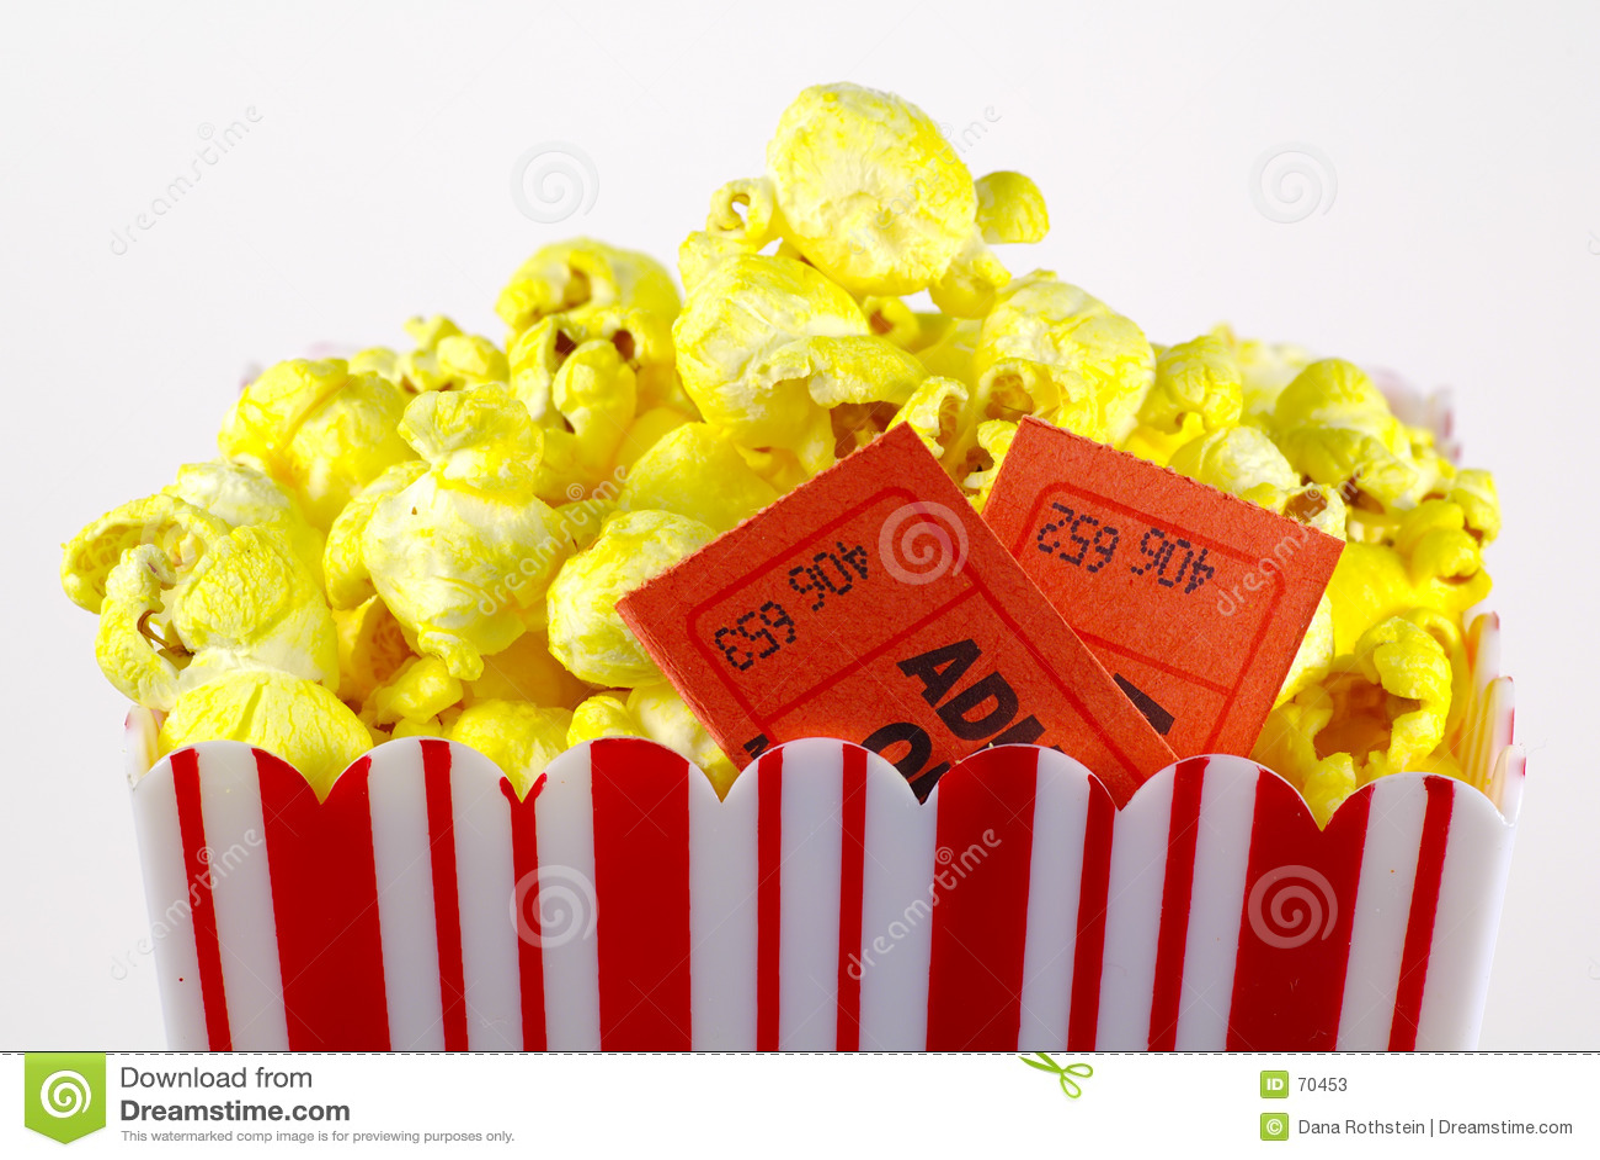 3 popcorn